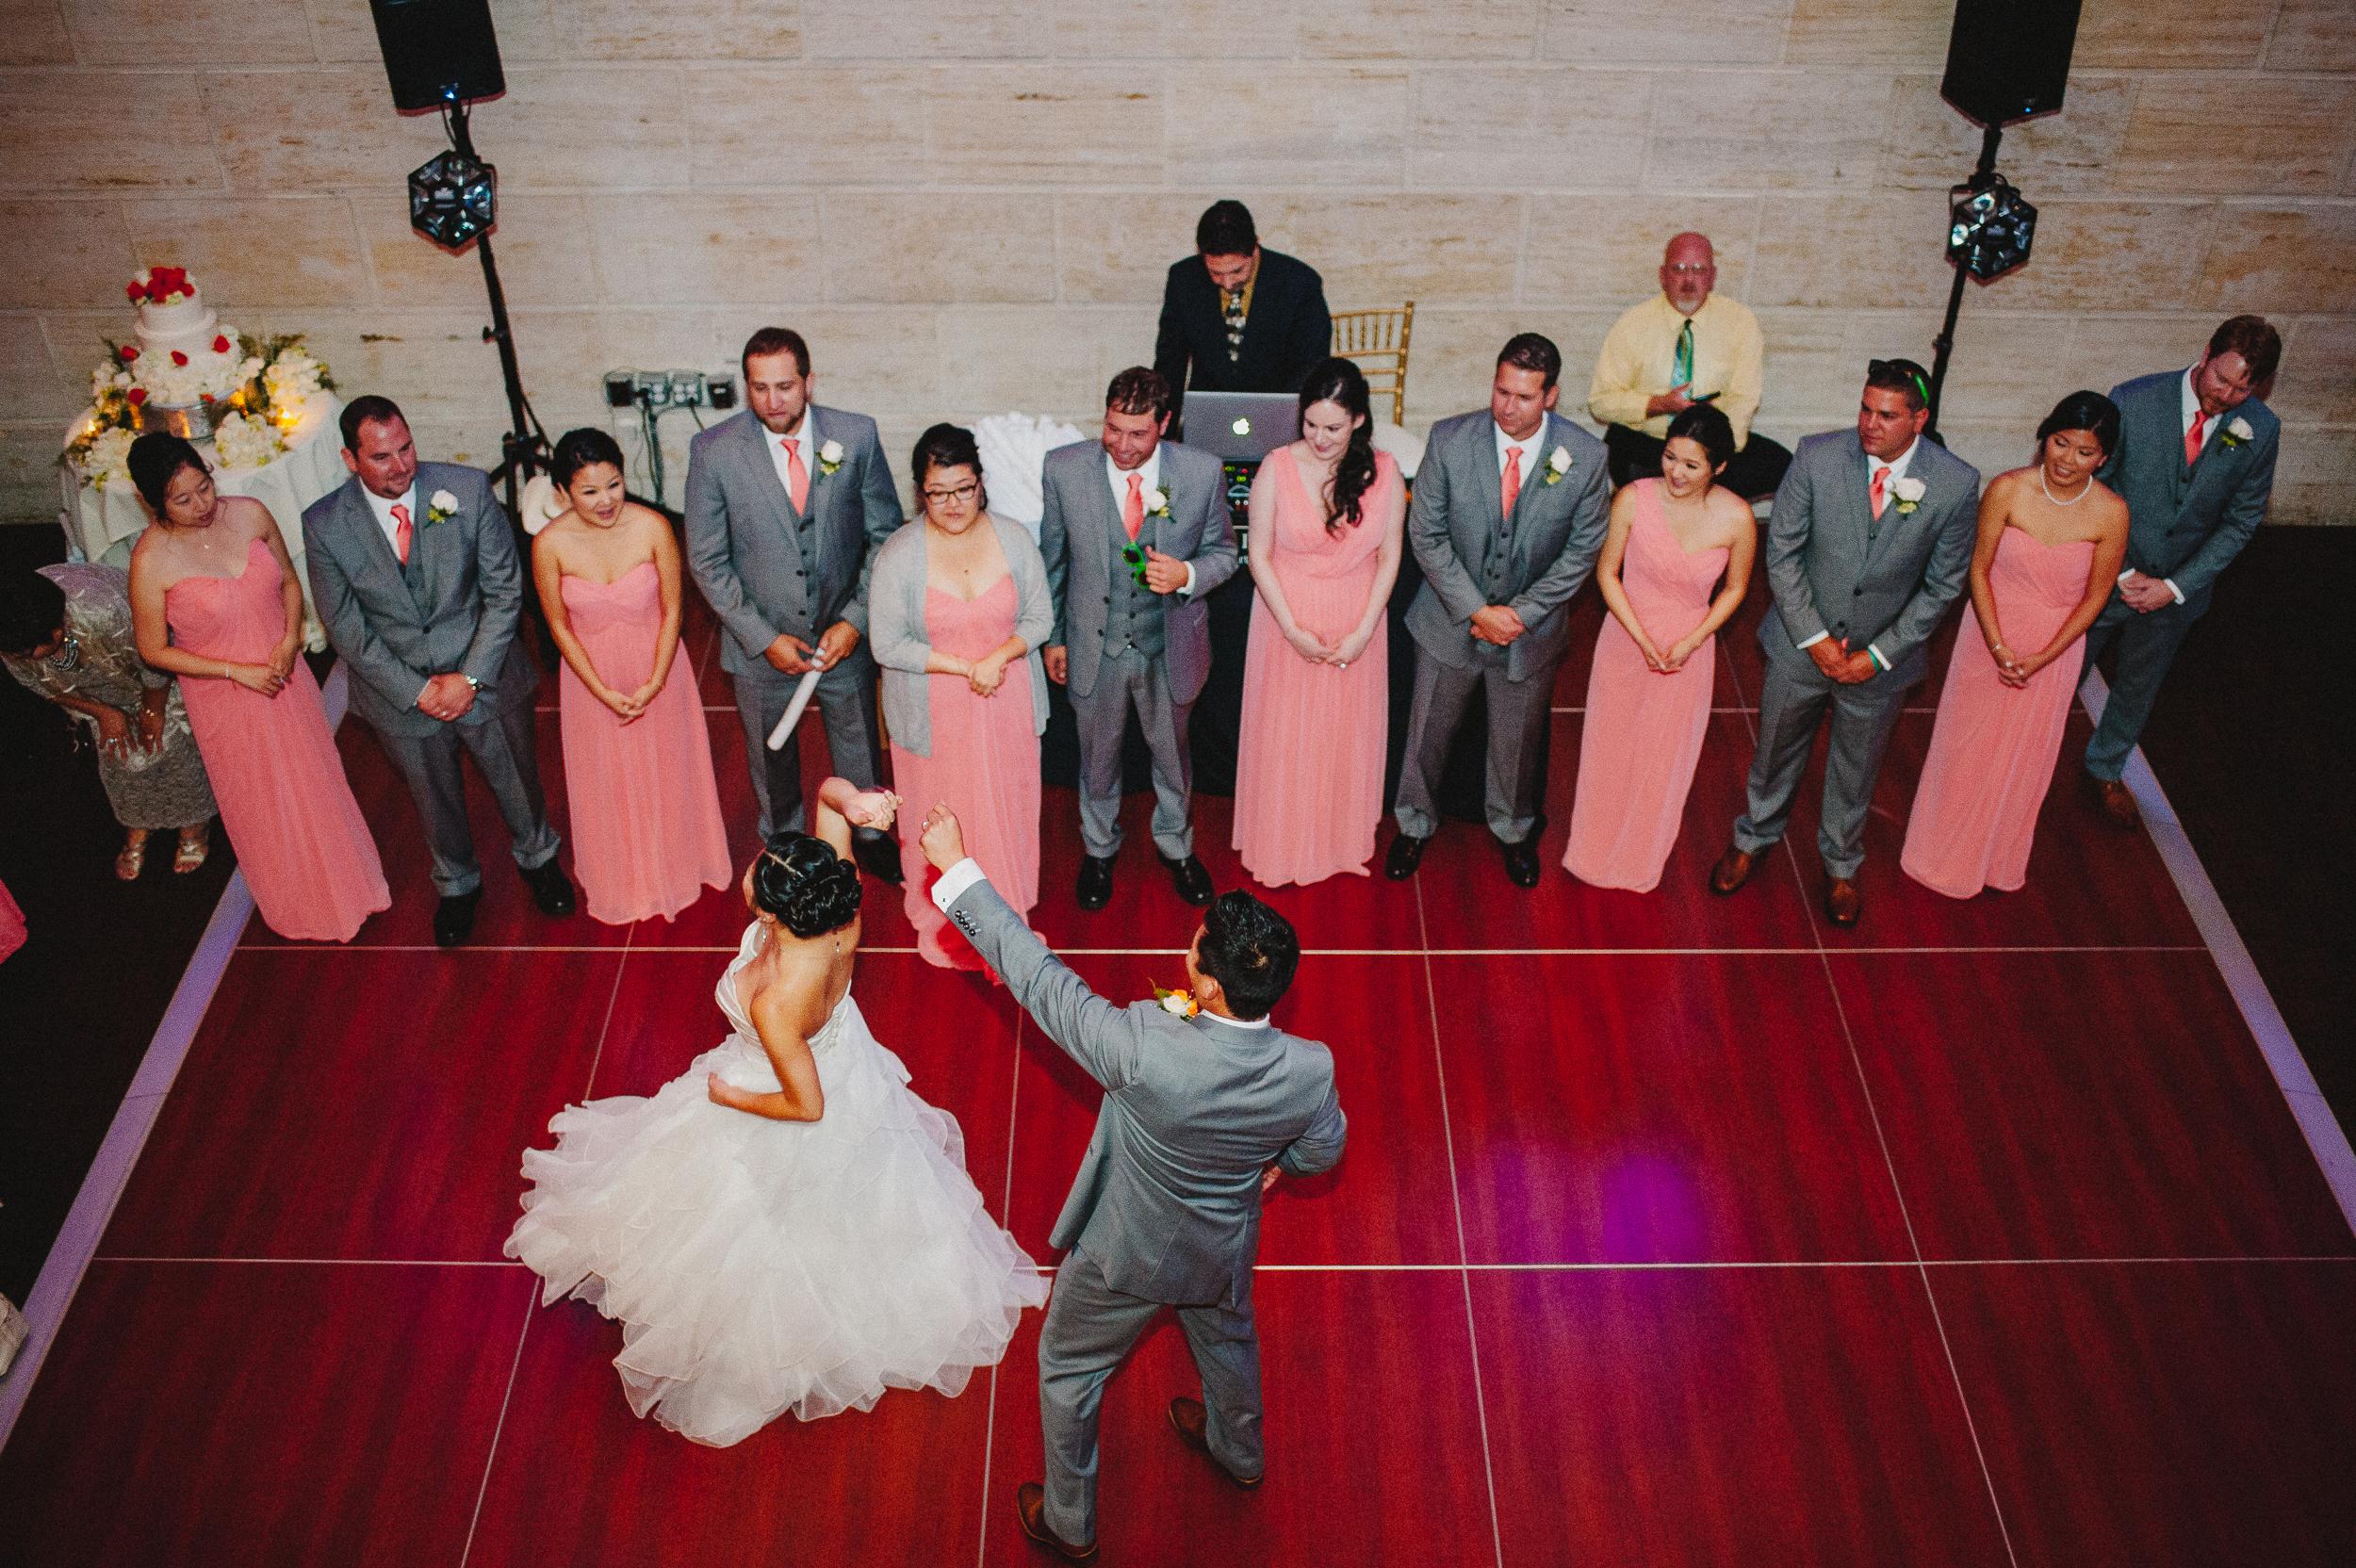 union-trust-philadelphia-wedding-photographer-66.jpg